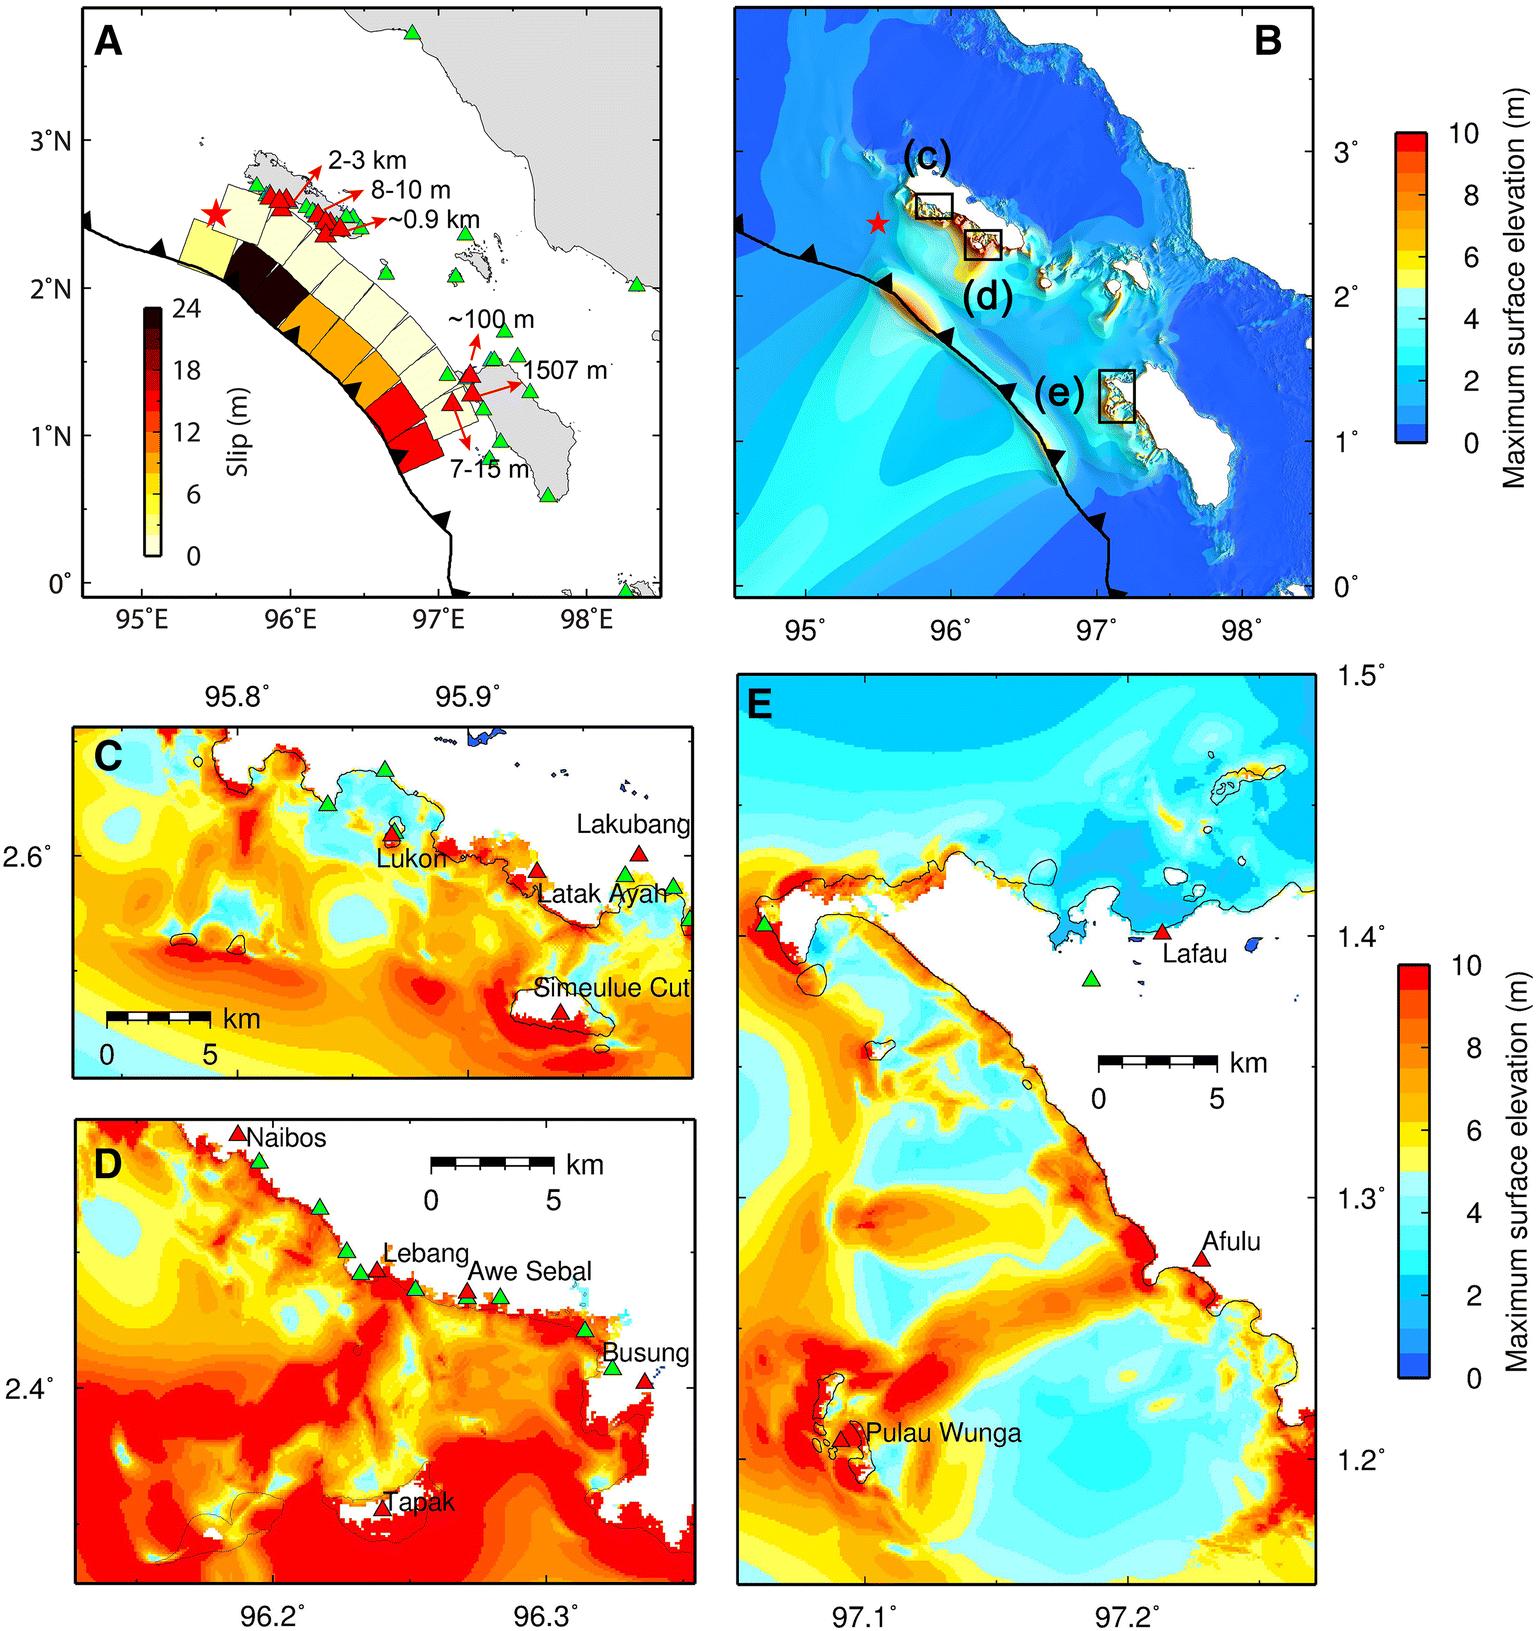 Reassessment Of The 1907 Sumatra Tsunami Earthquake Based